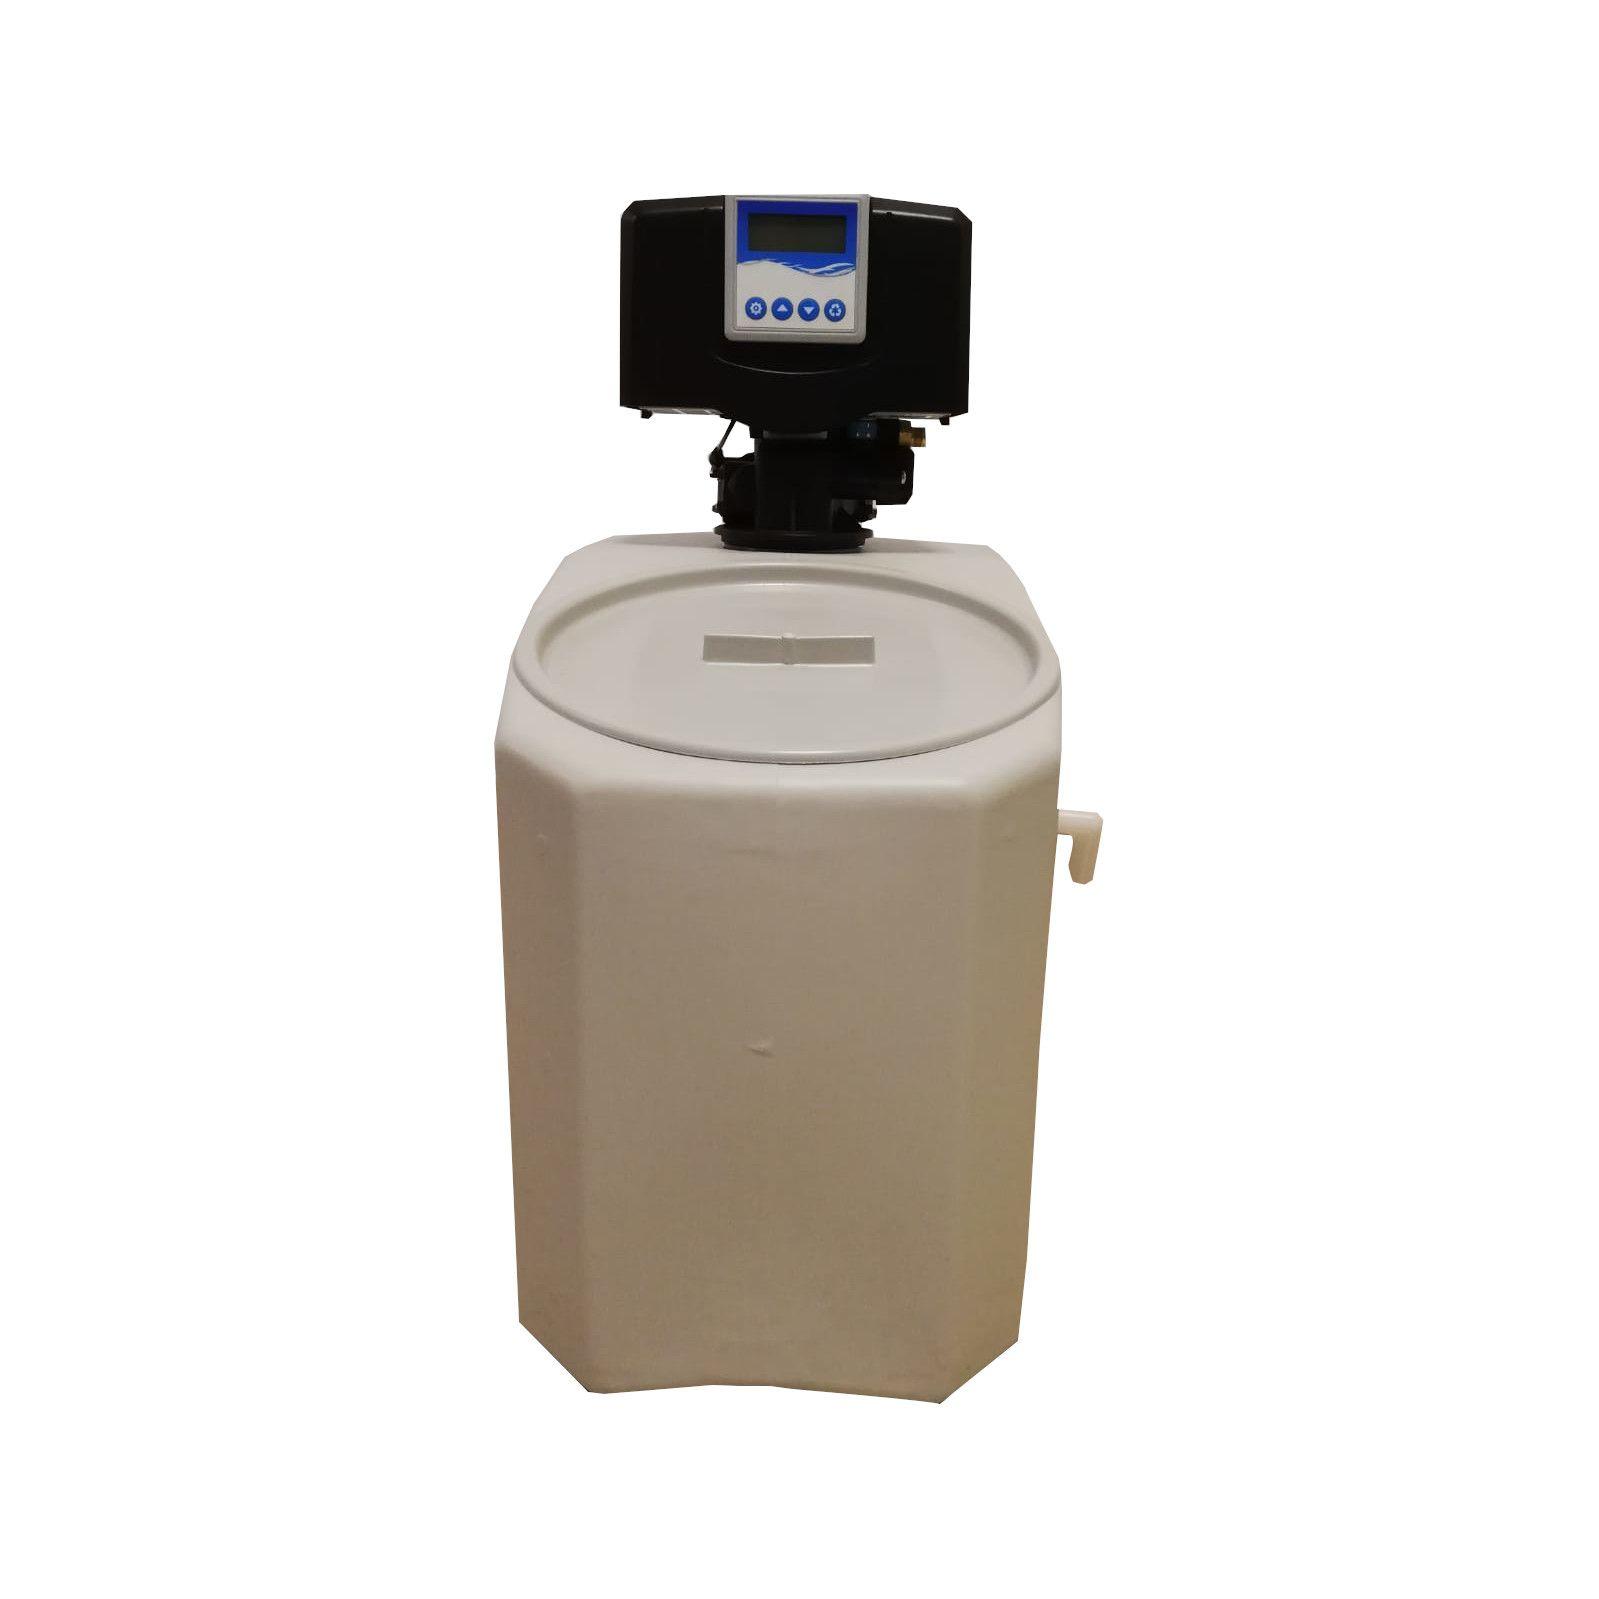 Dedurizator apa Aqua Mini 5-E14M, Debit 0.3 mc/h, Capacitate filtrare 2.600 litri, Cartus din Rasina Cationica - AquaFilters.ro